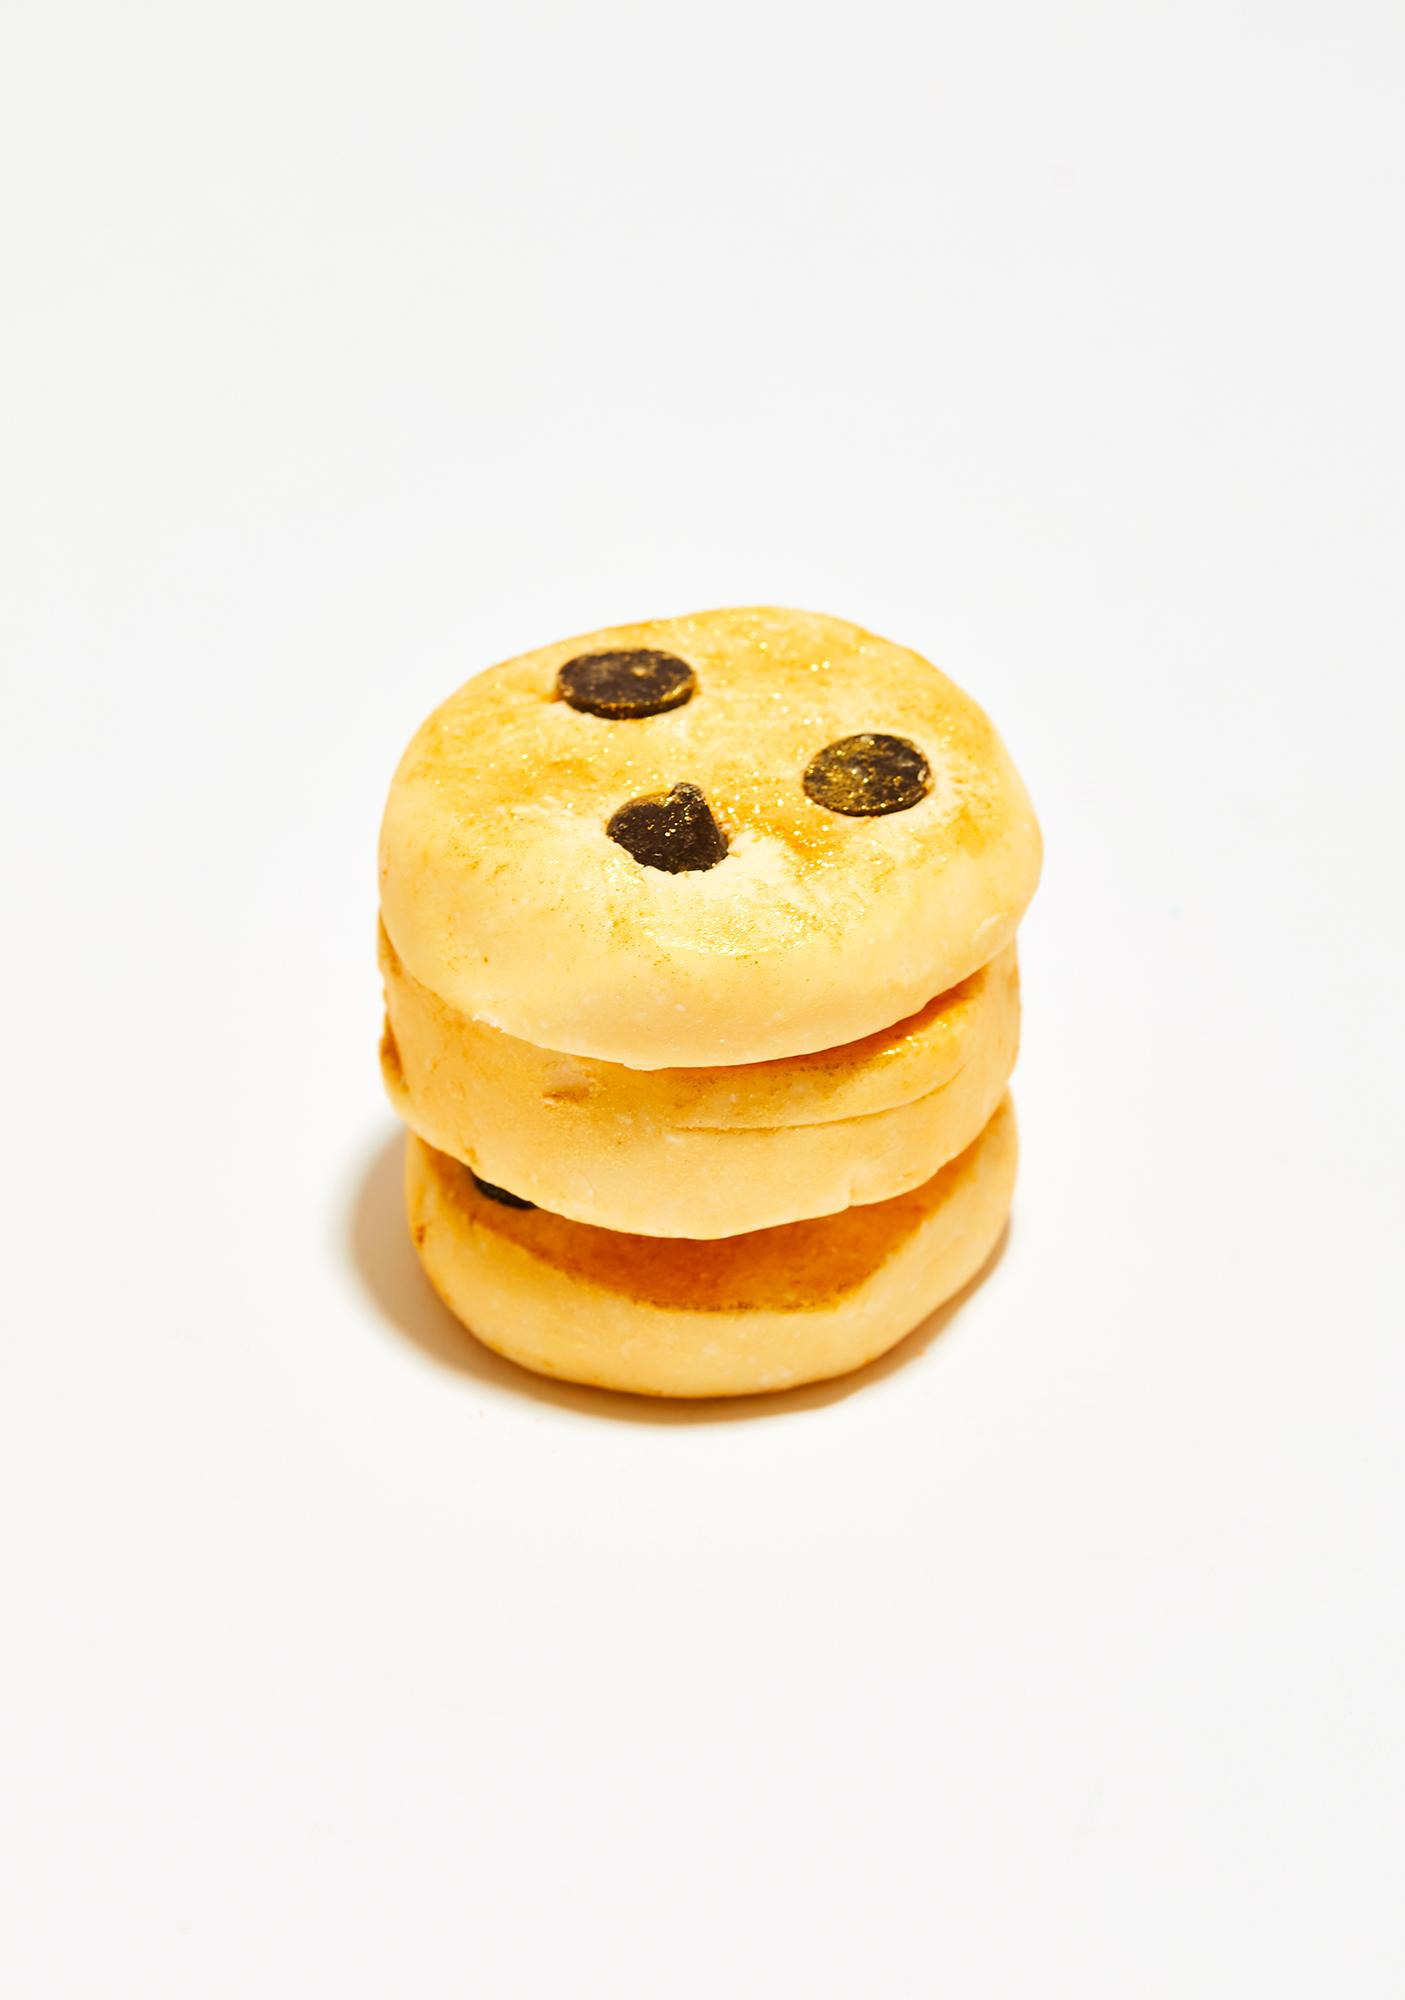 New York's Bathhouse Chocolate Chip Cookies Bubble Bars